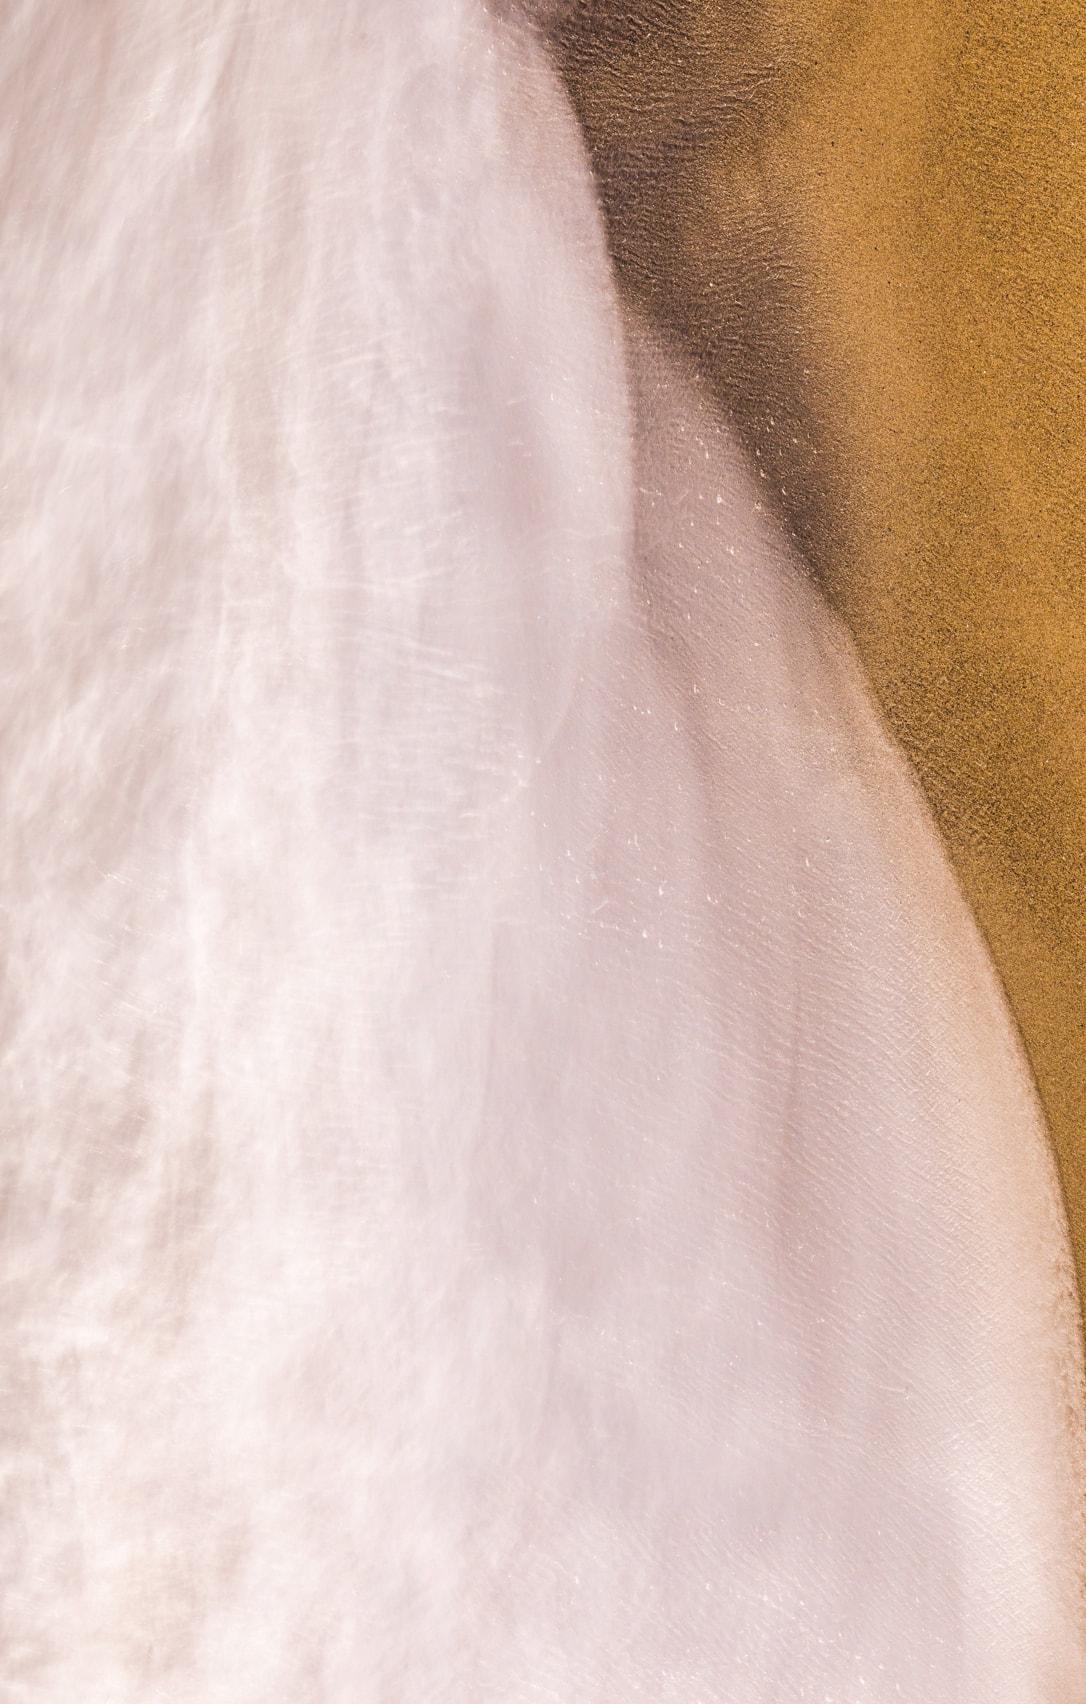 Fur/suede texture